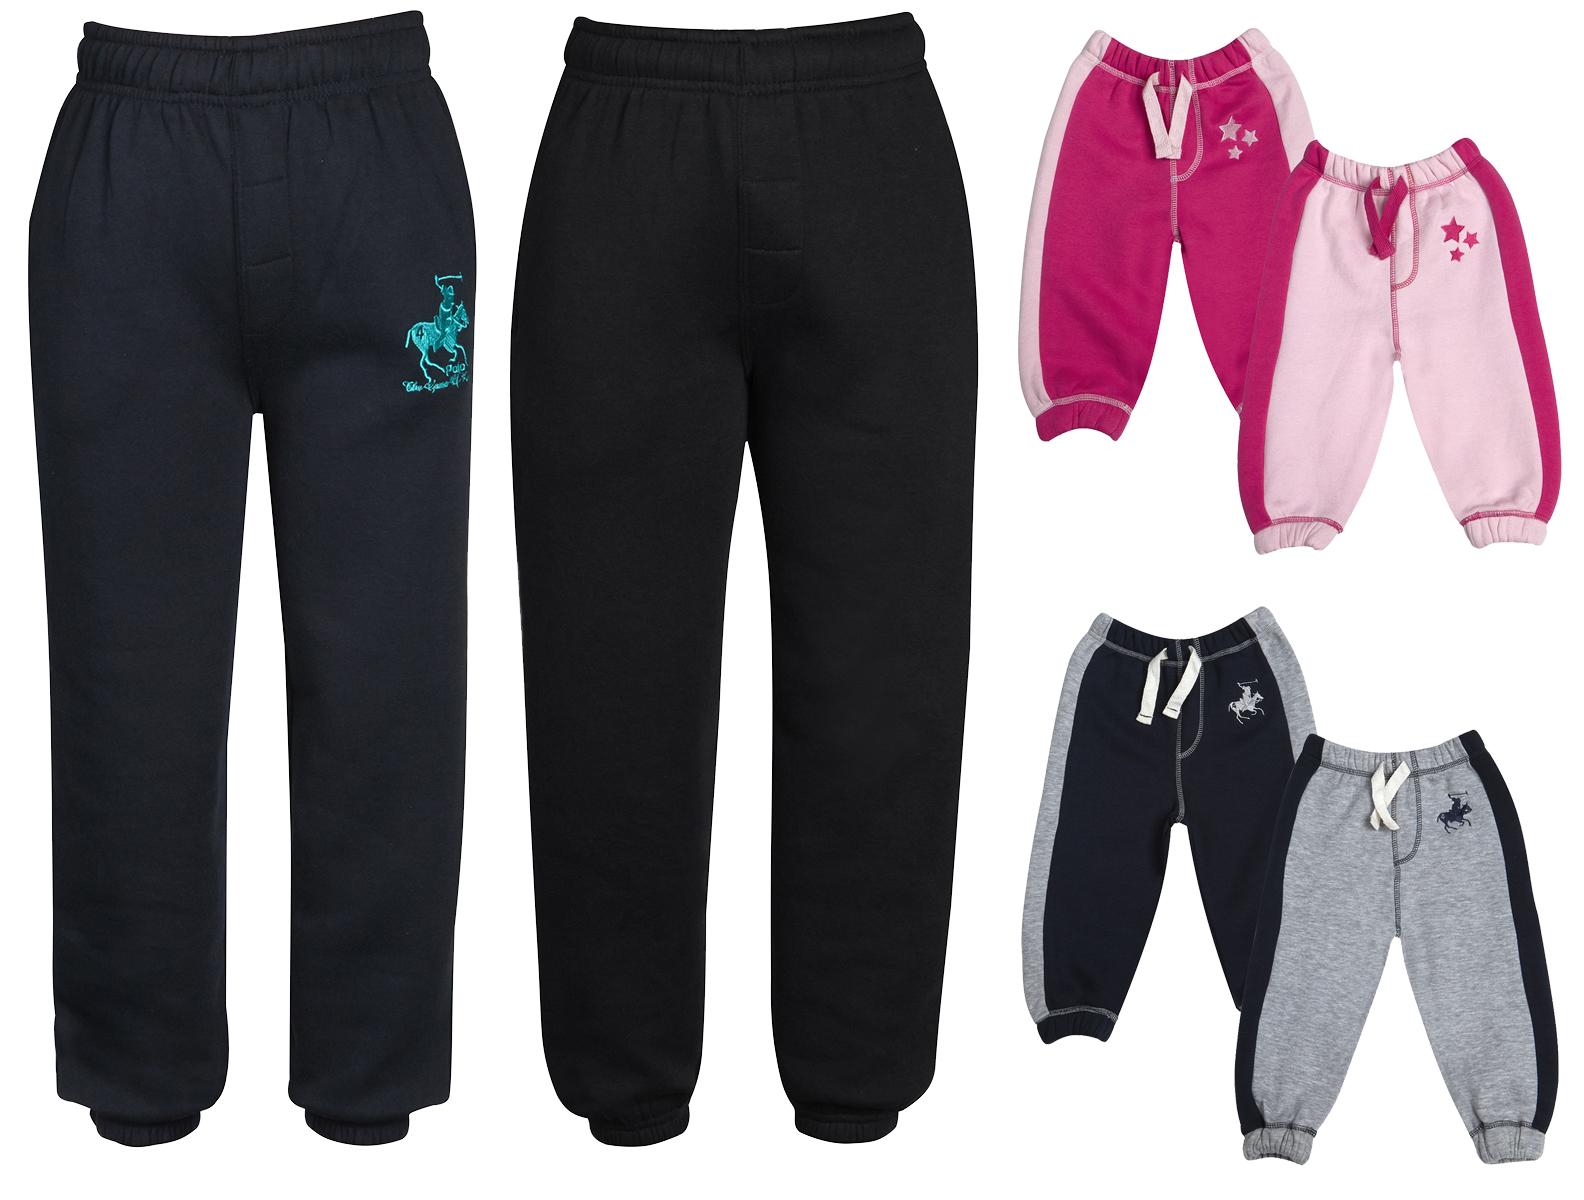 9adc13d2 Boys Girls Joggers Jogging Pants Fleece Tracksuit Bottoms PE School Kids  Sizes | eBay